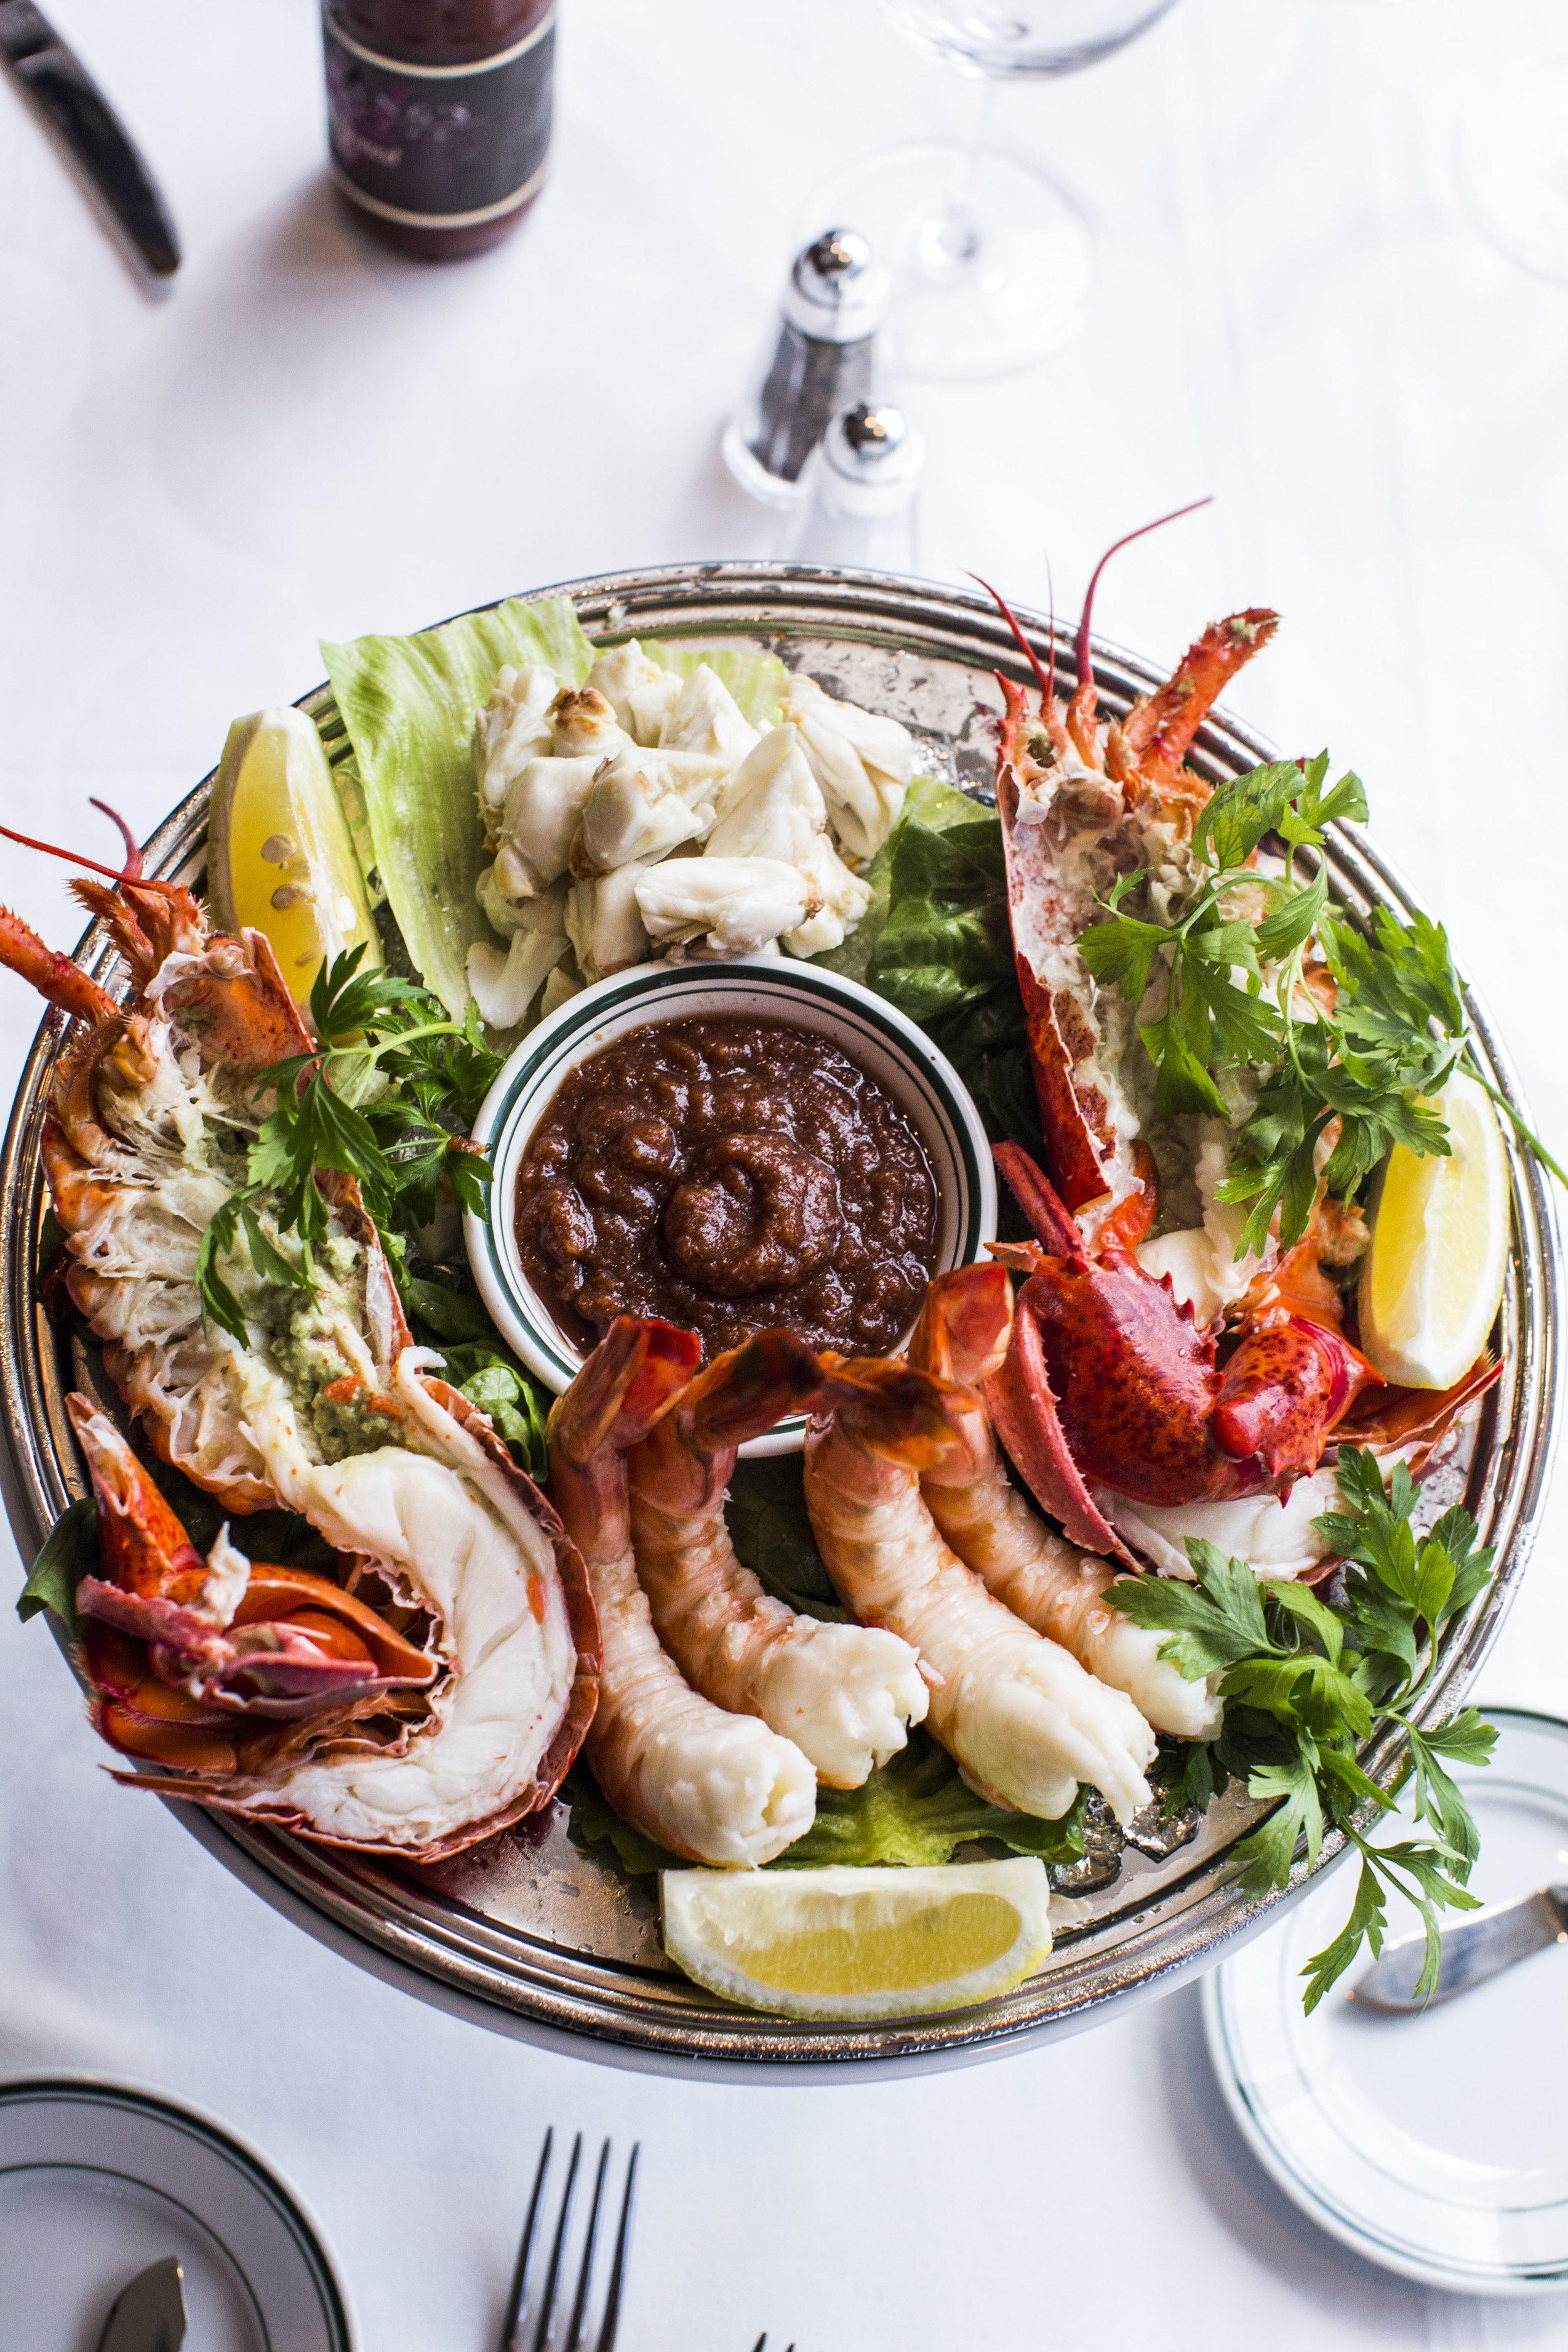 Wolfgang_s Steakhouse - seafood platter.jpg